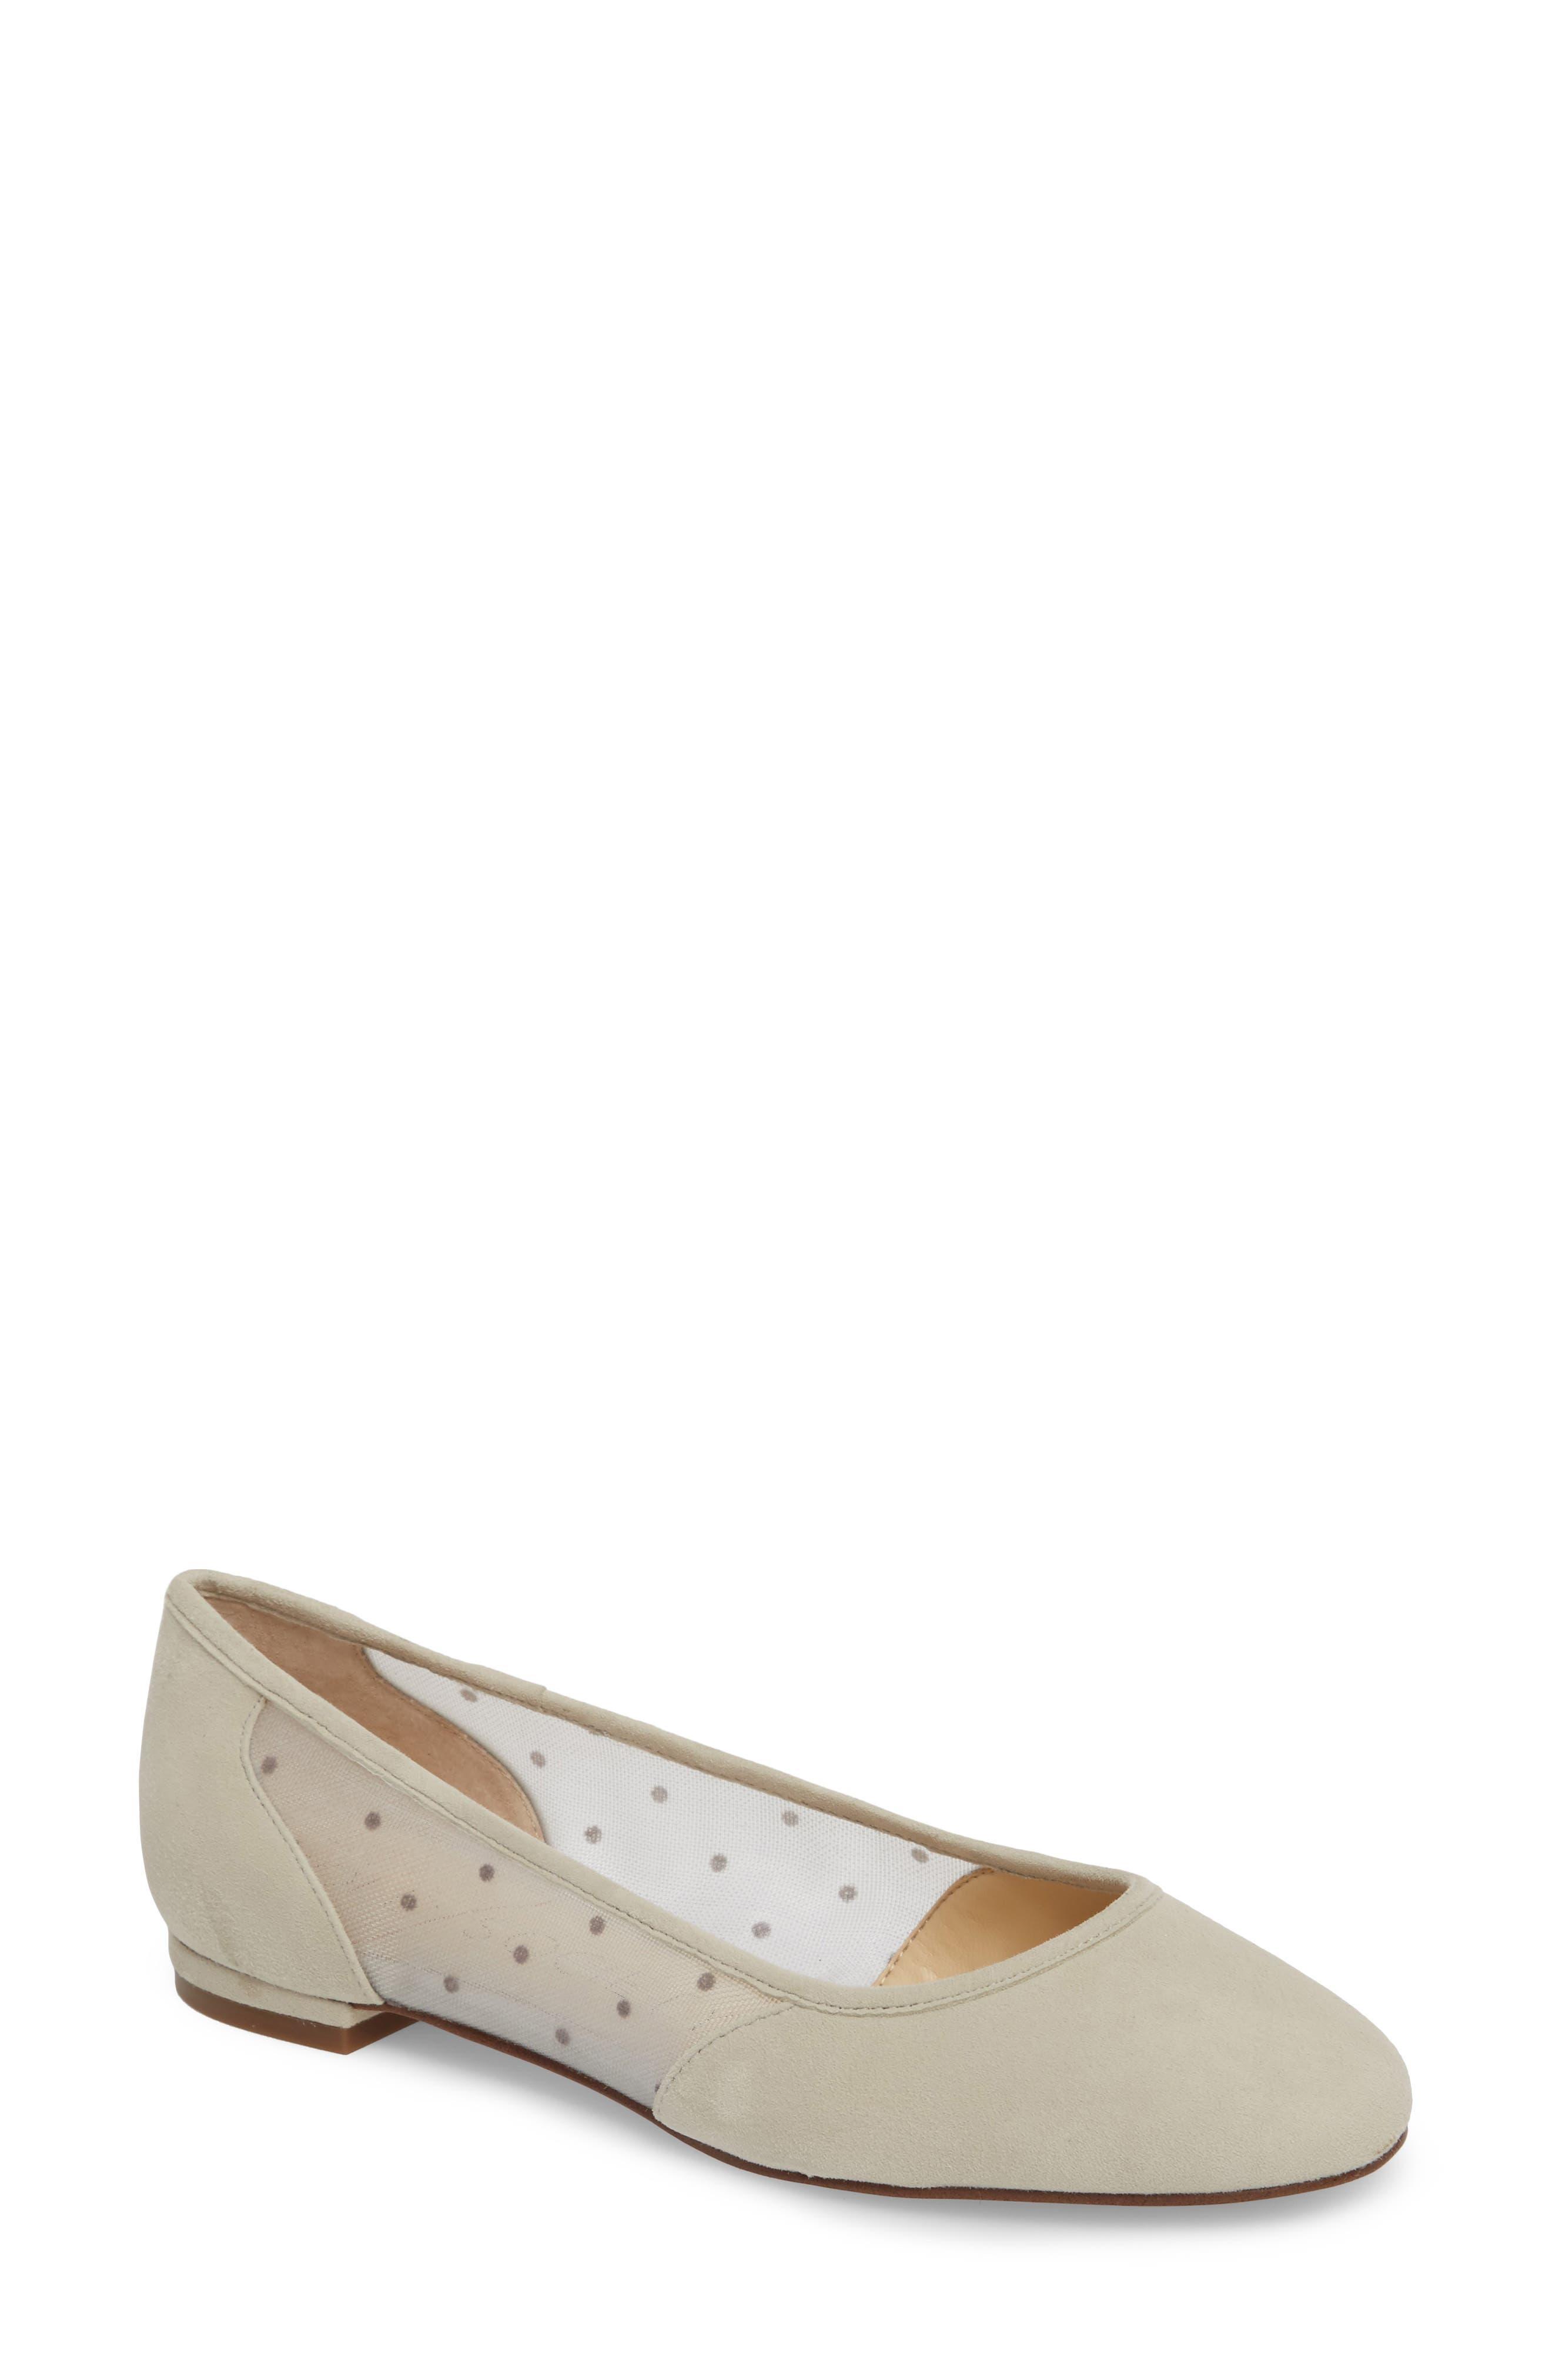 Pammy Ballet Flat,                         Main,                         color, Dove Grey